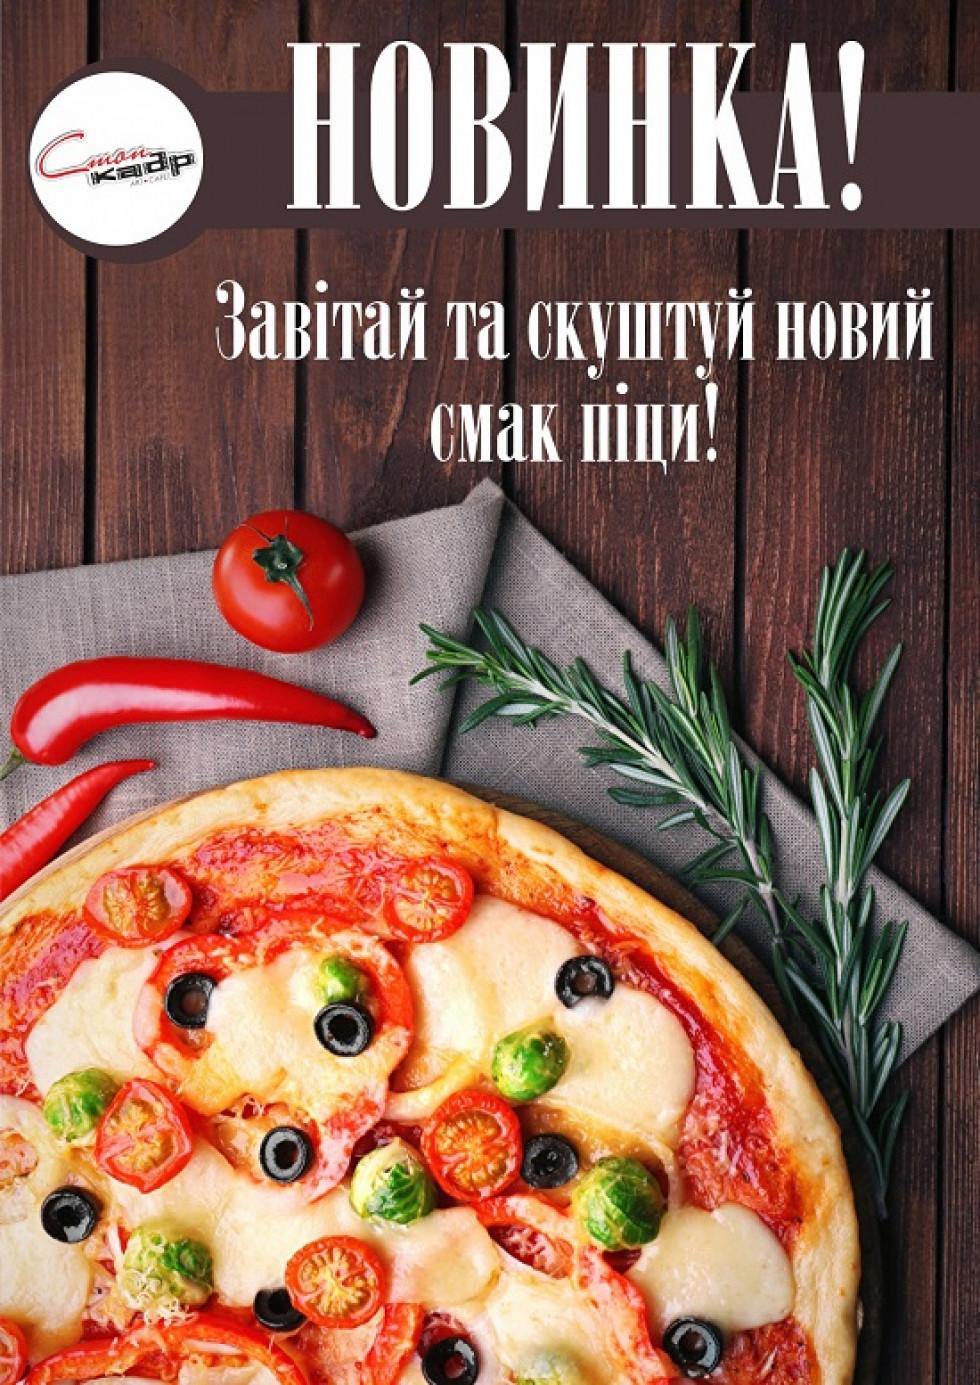 В арт-кафе «Стоп Кадр» новинка – піца в стилі «арт»